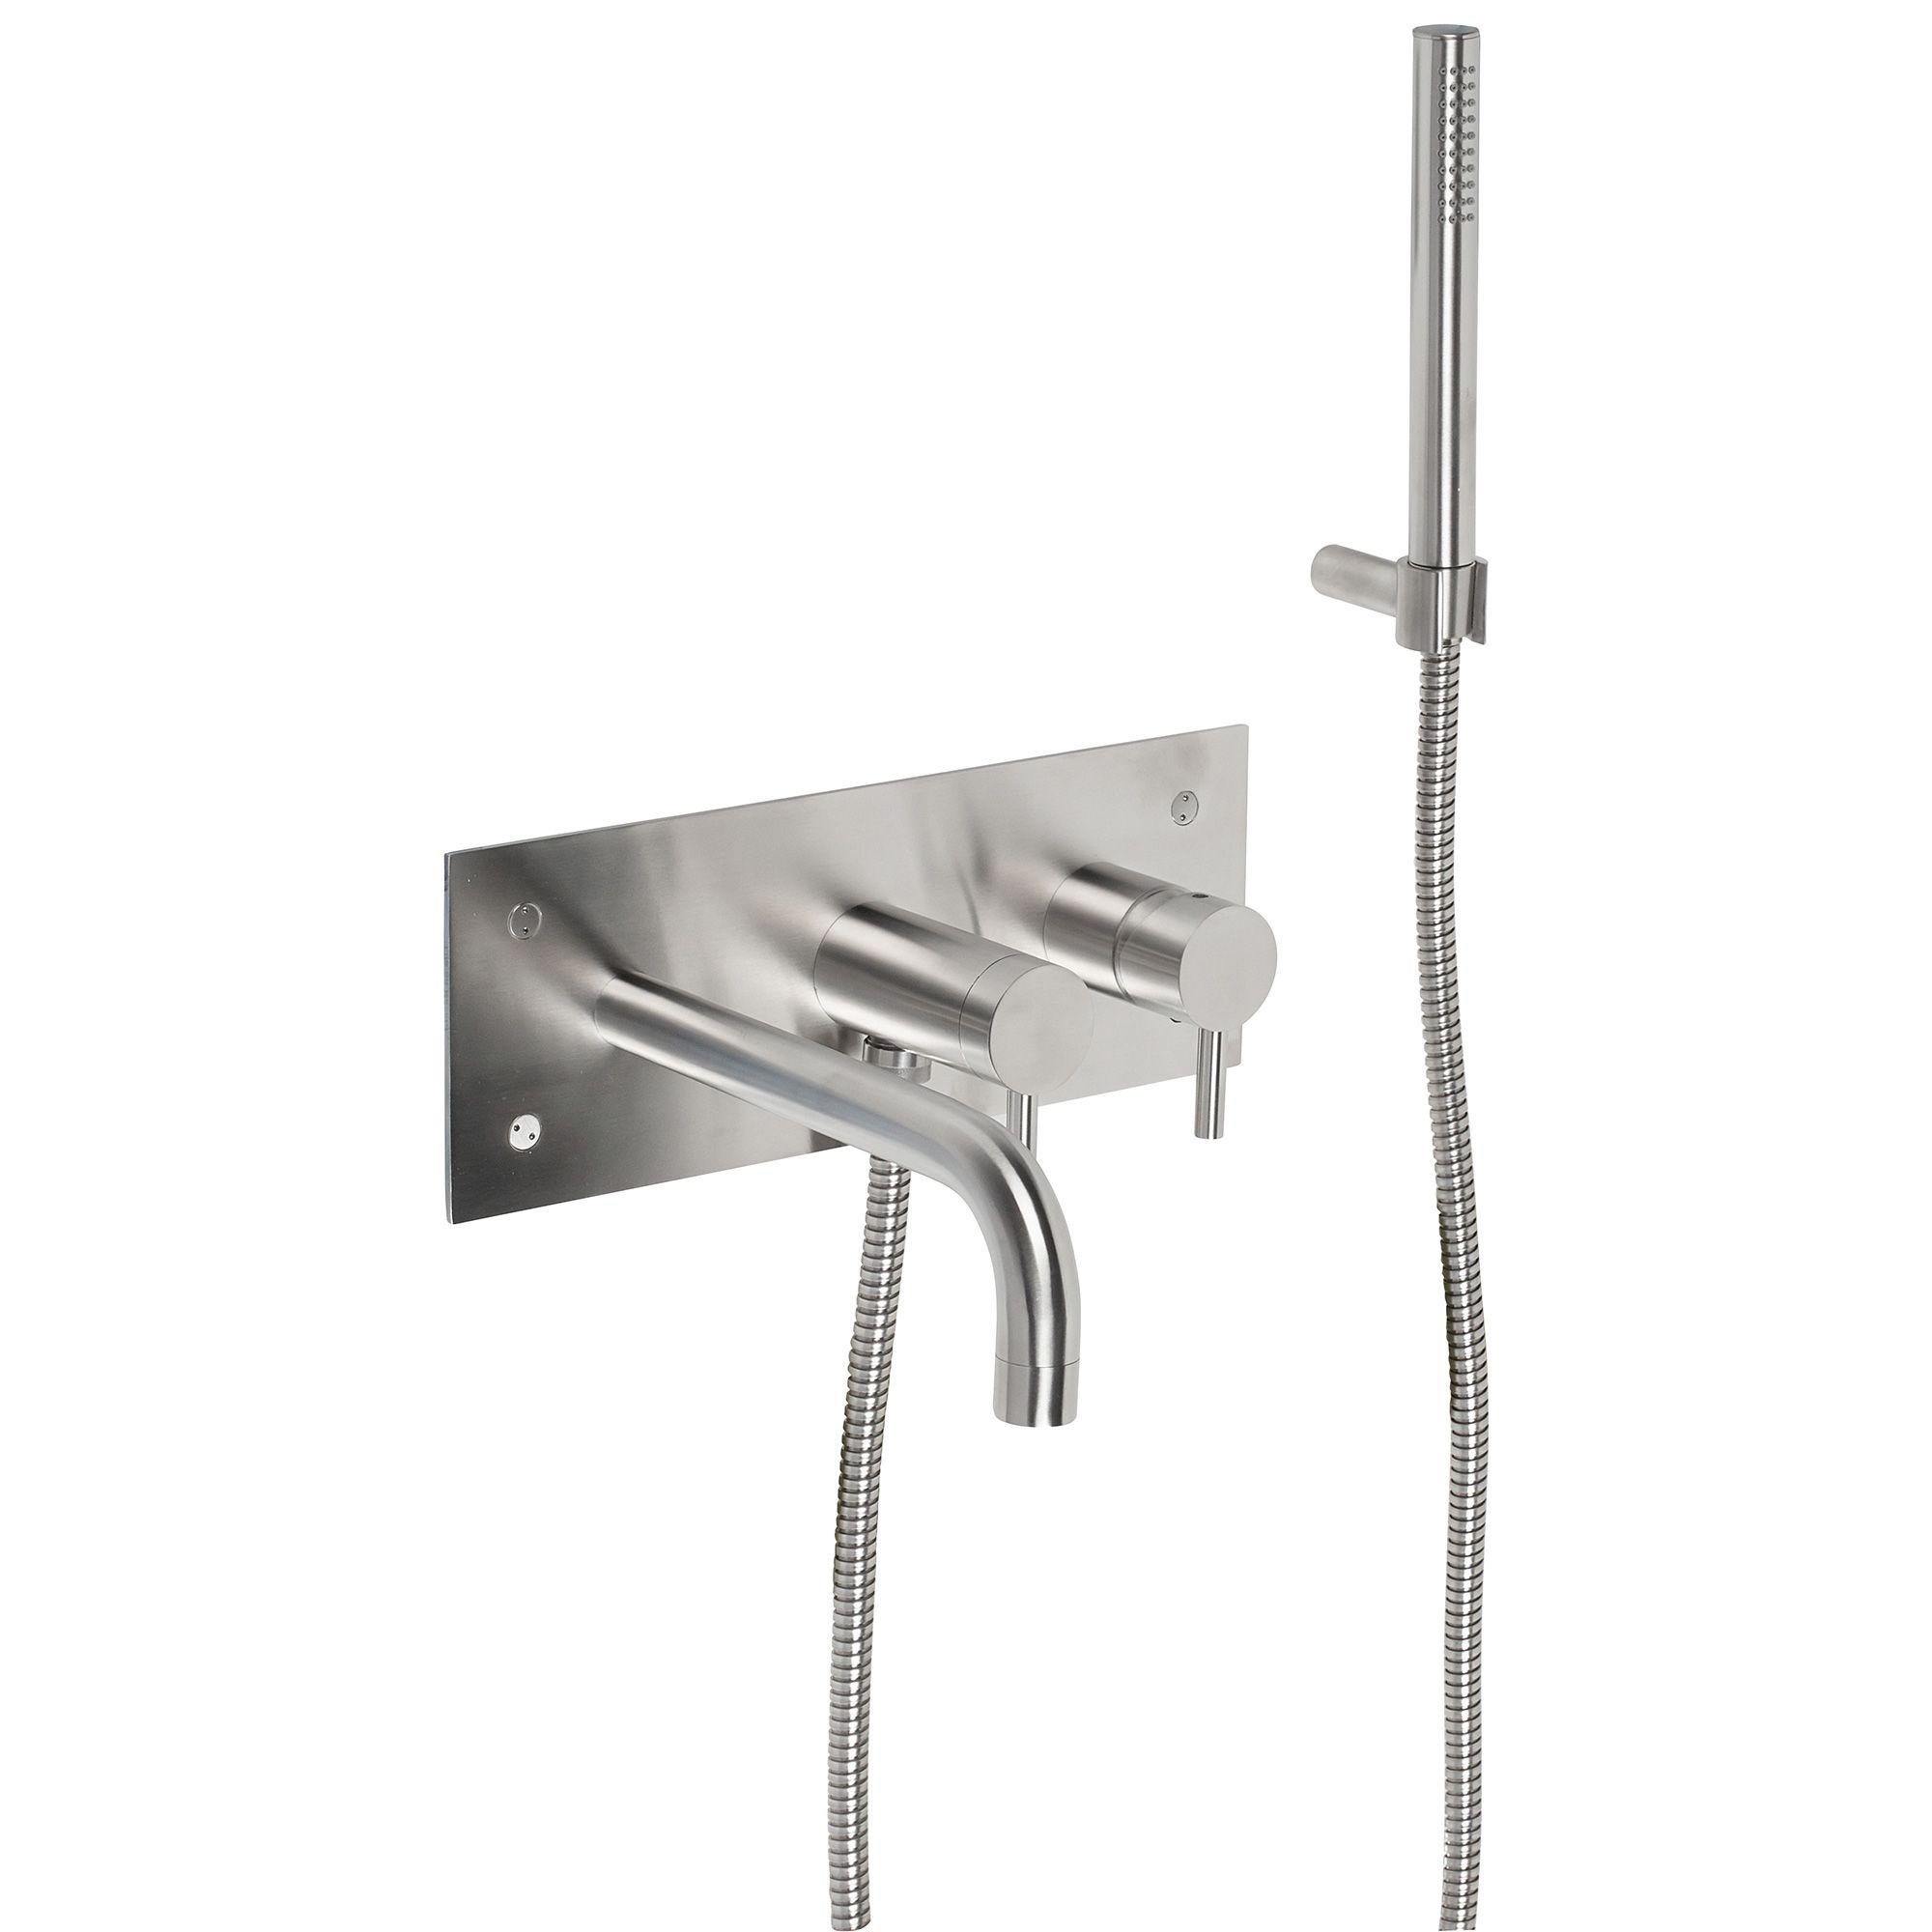 Hudson Wall mounted bath/shower mixer